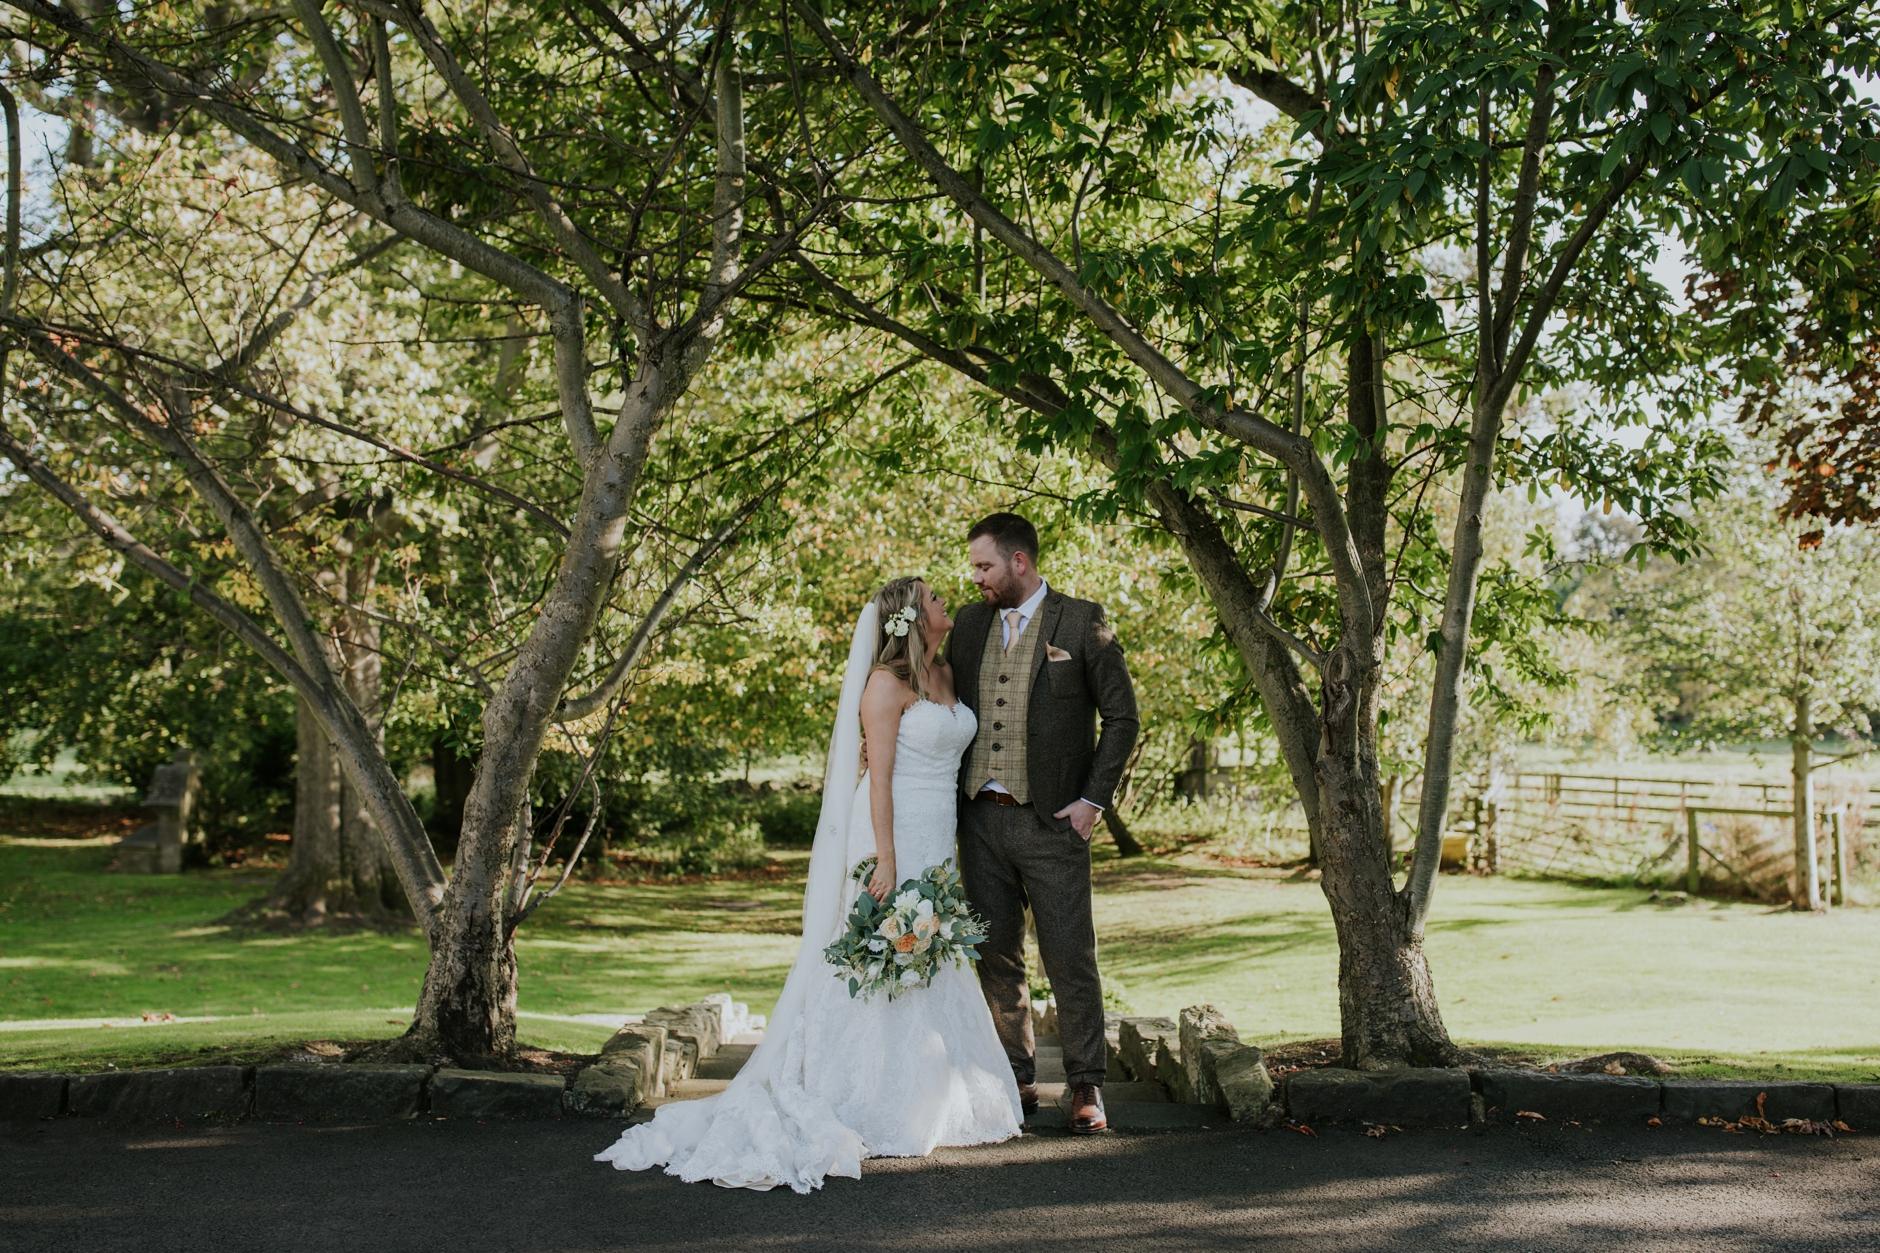 edinburgh micro wedding photographer